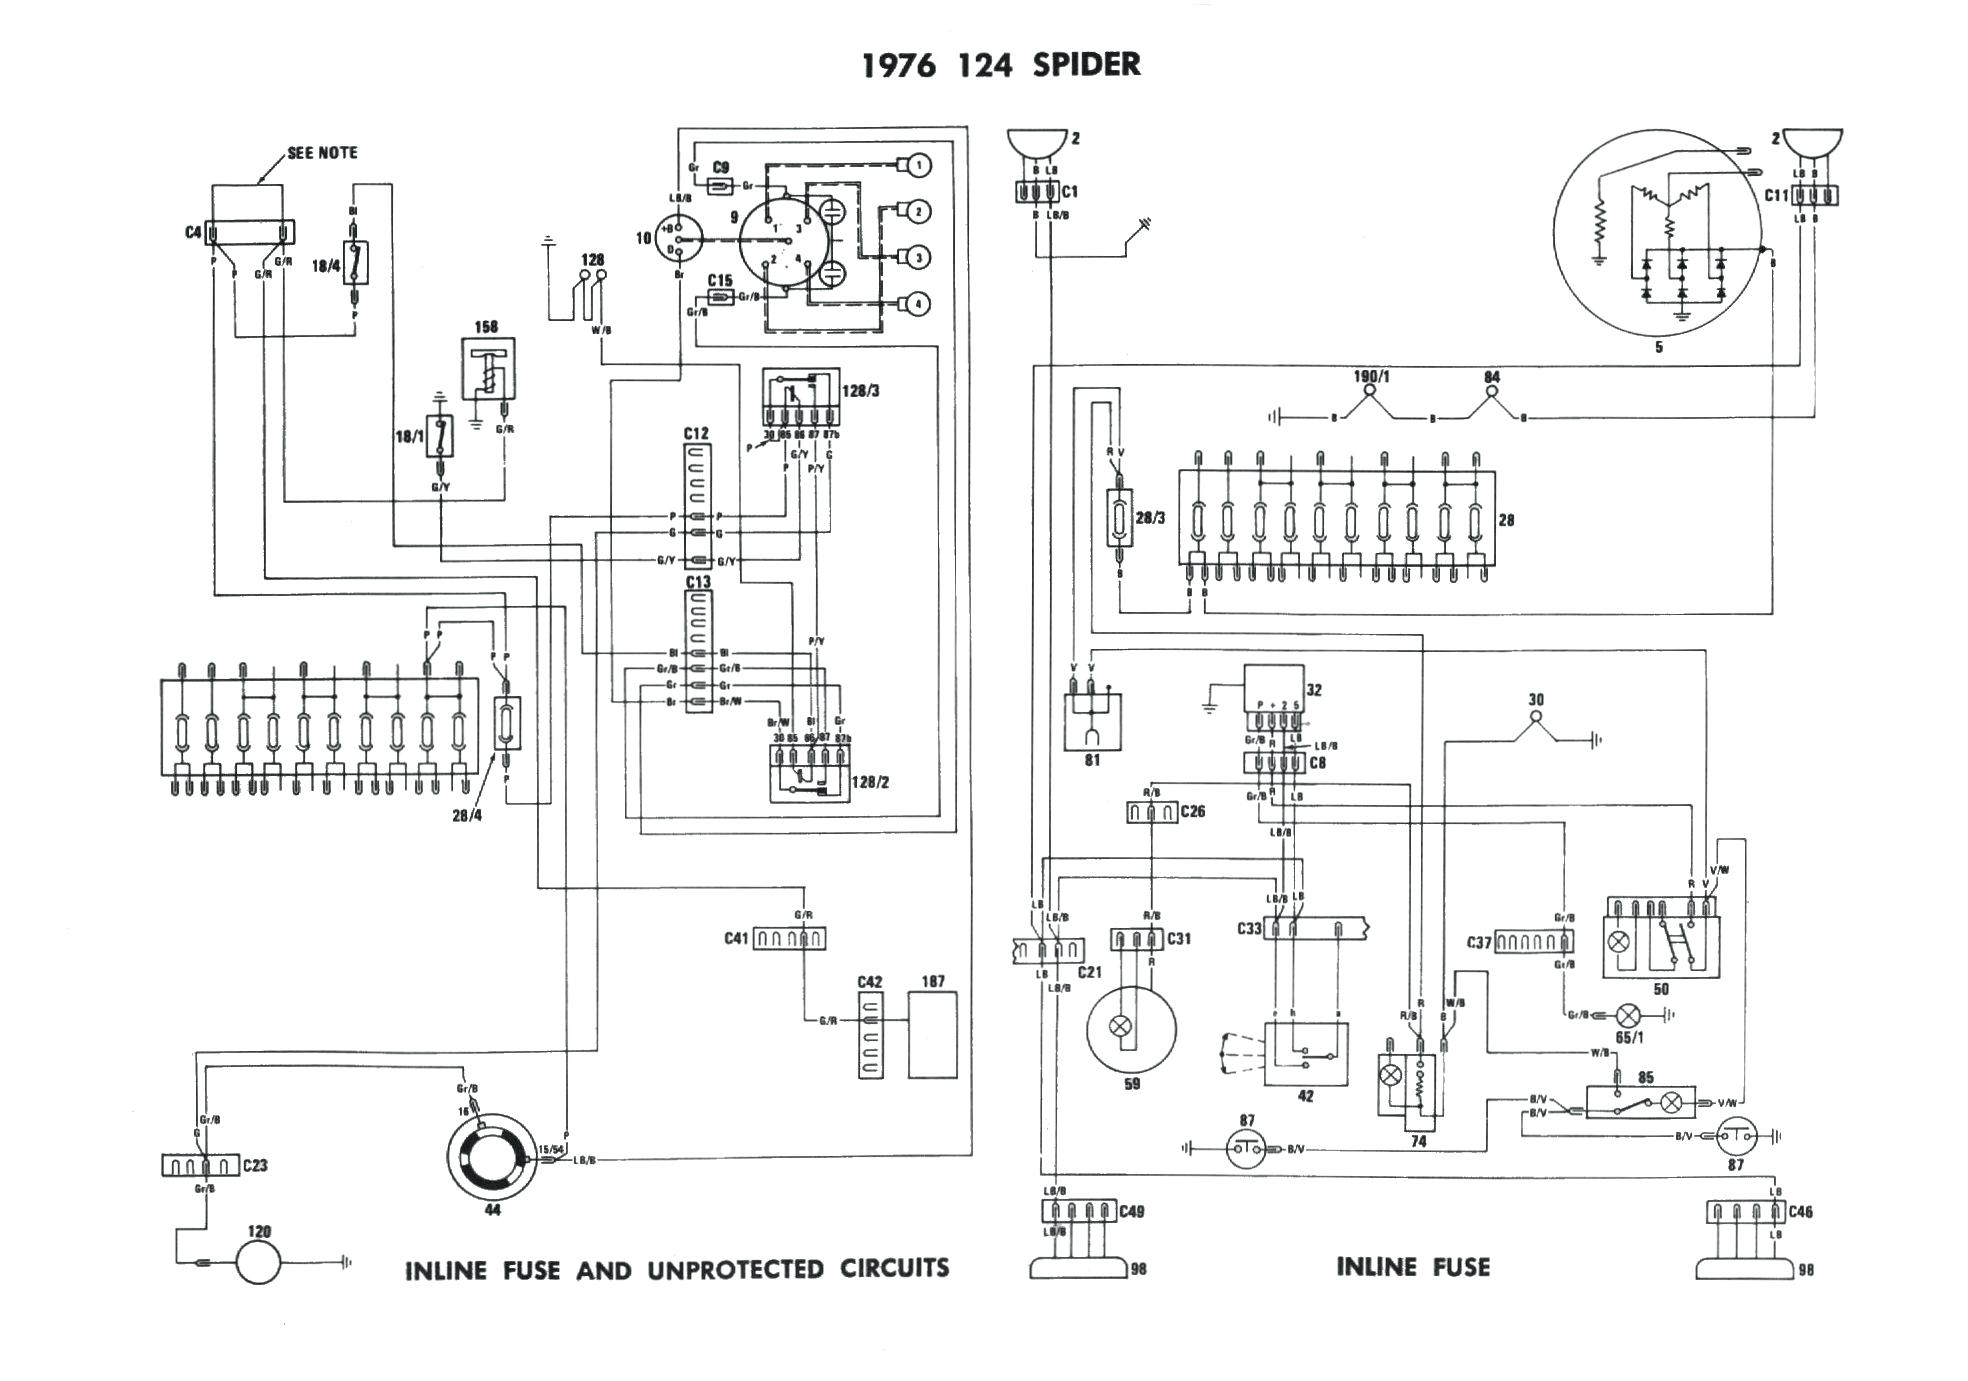 wiring a fiat 128 - wiring diagrams mere-site-a -  mere-site-a.alcuoredeldiabete.it  al cuore del diabete